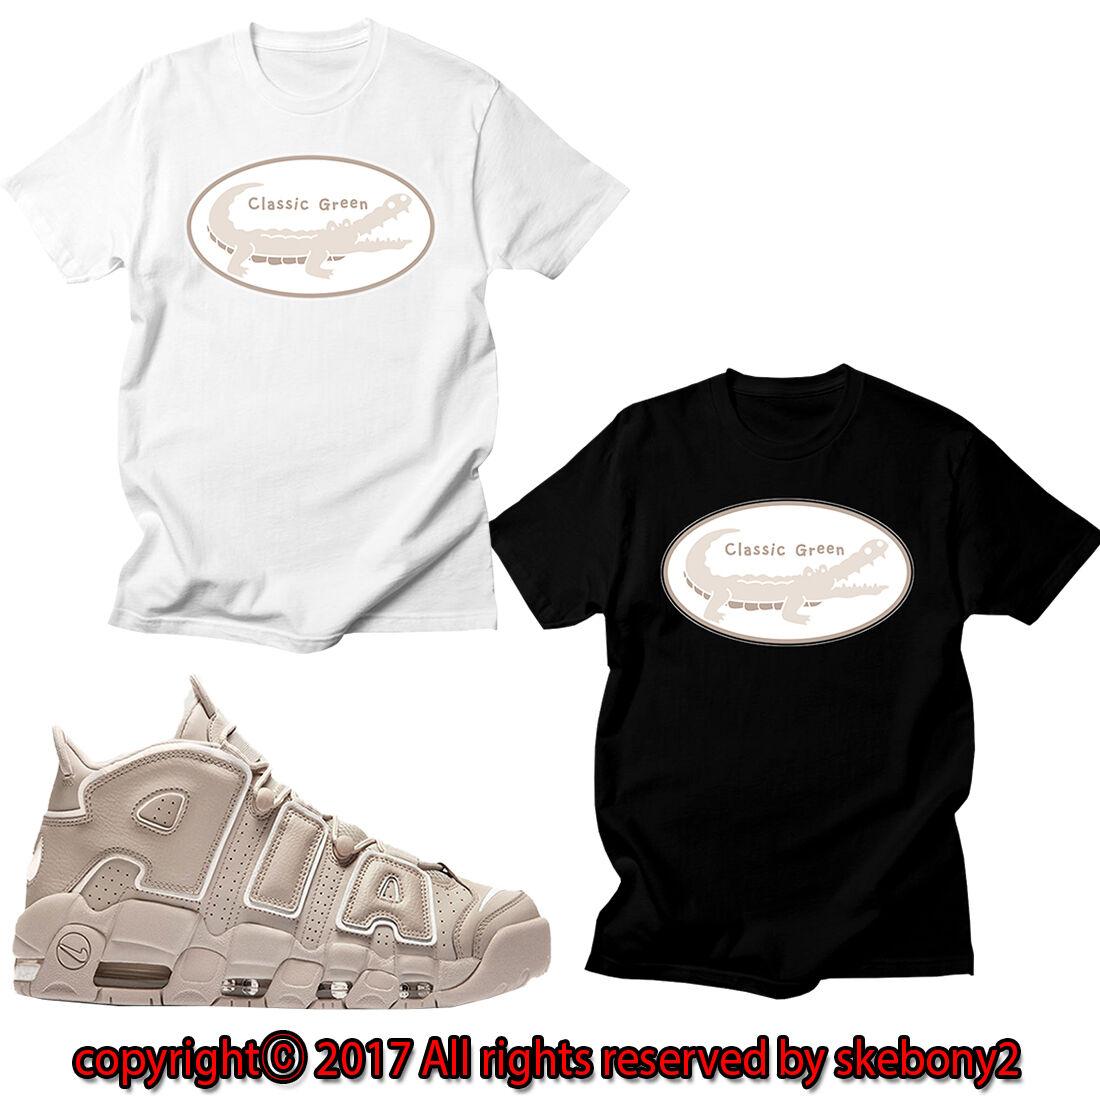 New Custom Tee Nike Air More Uptempo Matching T Shirt Utp 1 10 3